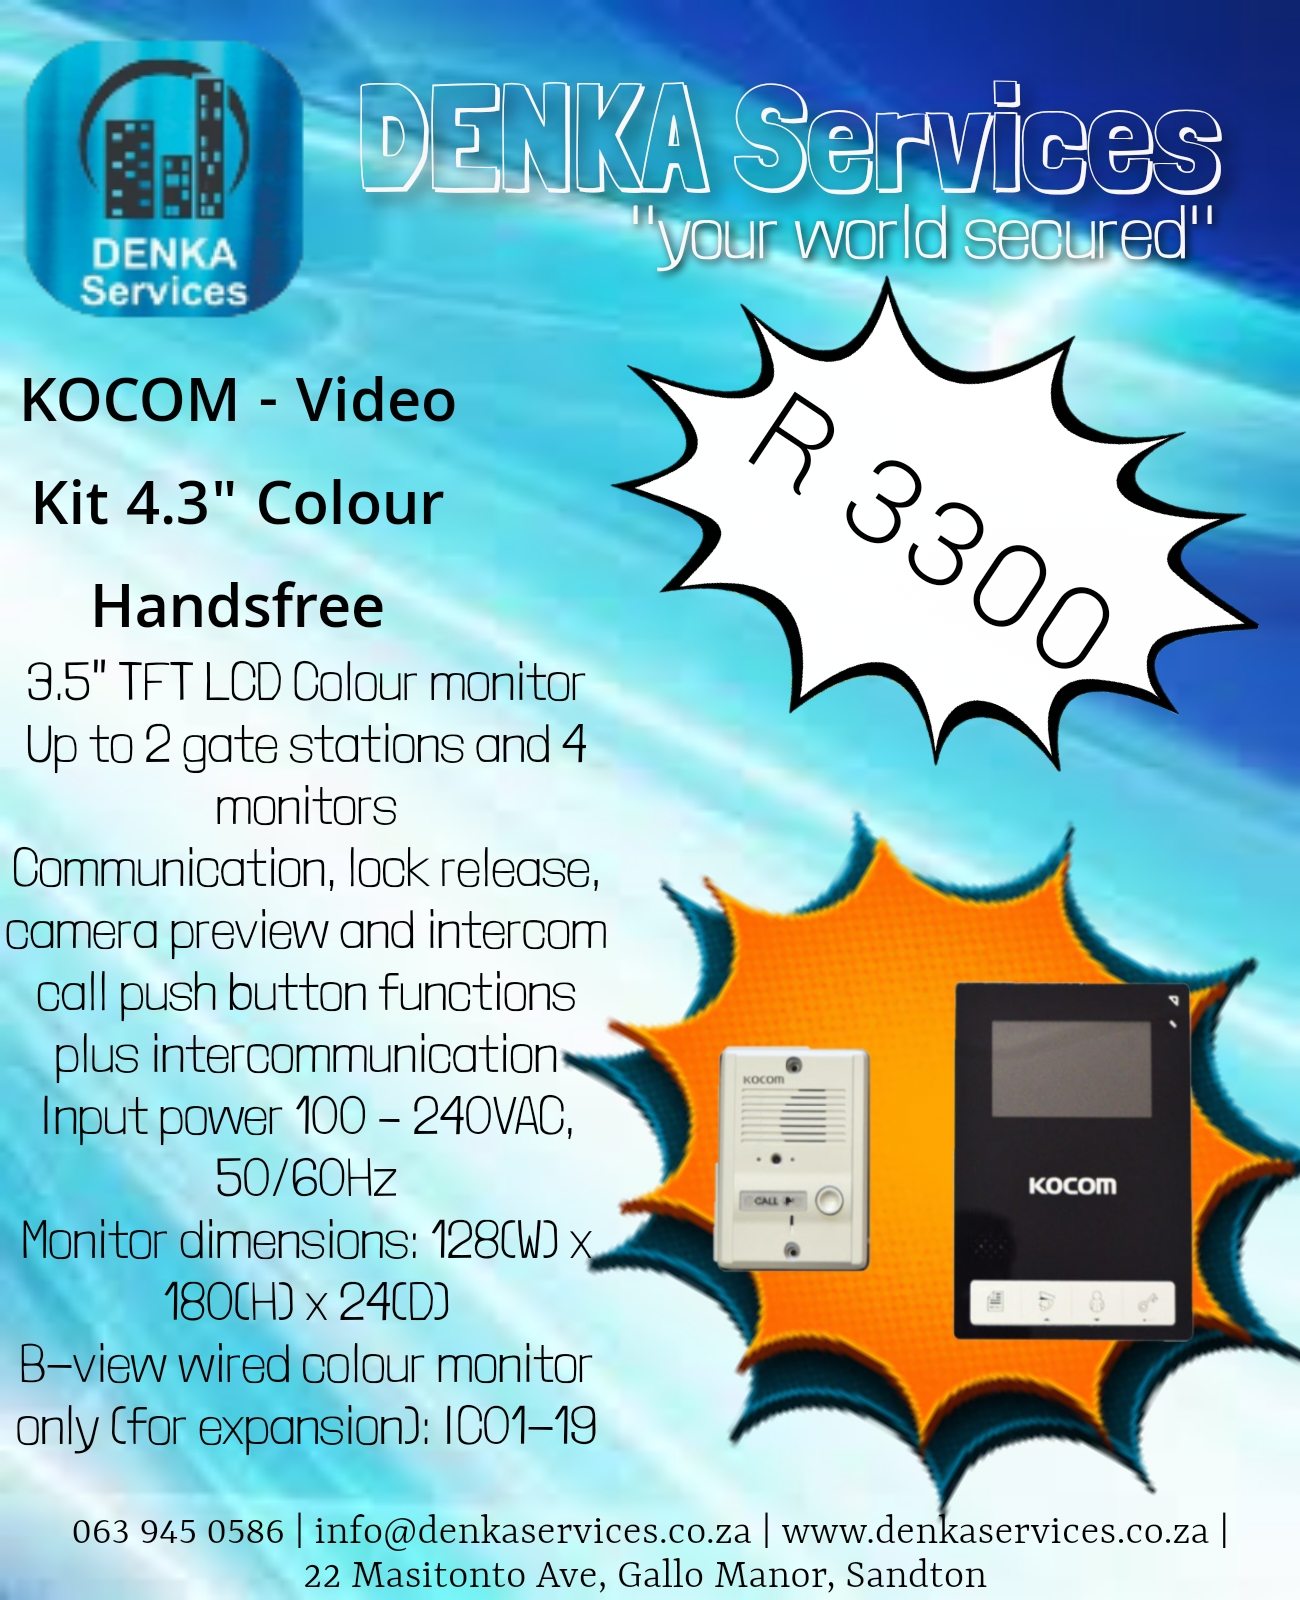 "Kocom - Video Kit 4.3"" Colour Handsfree"